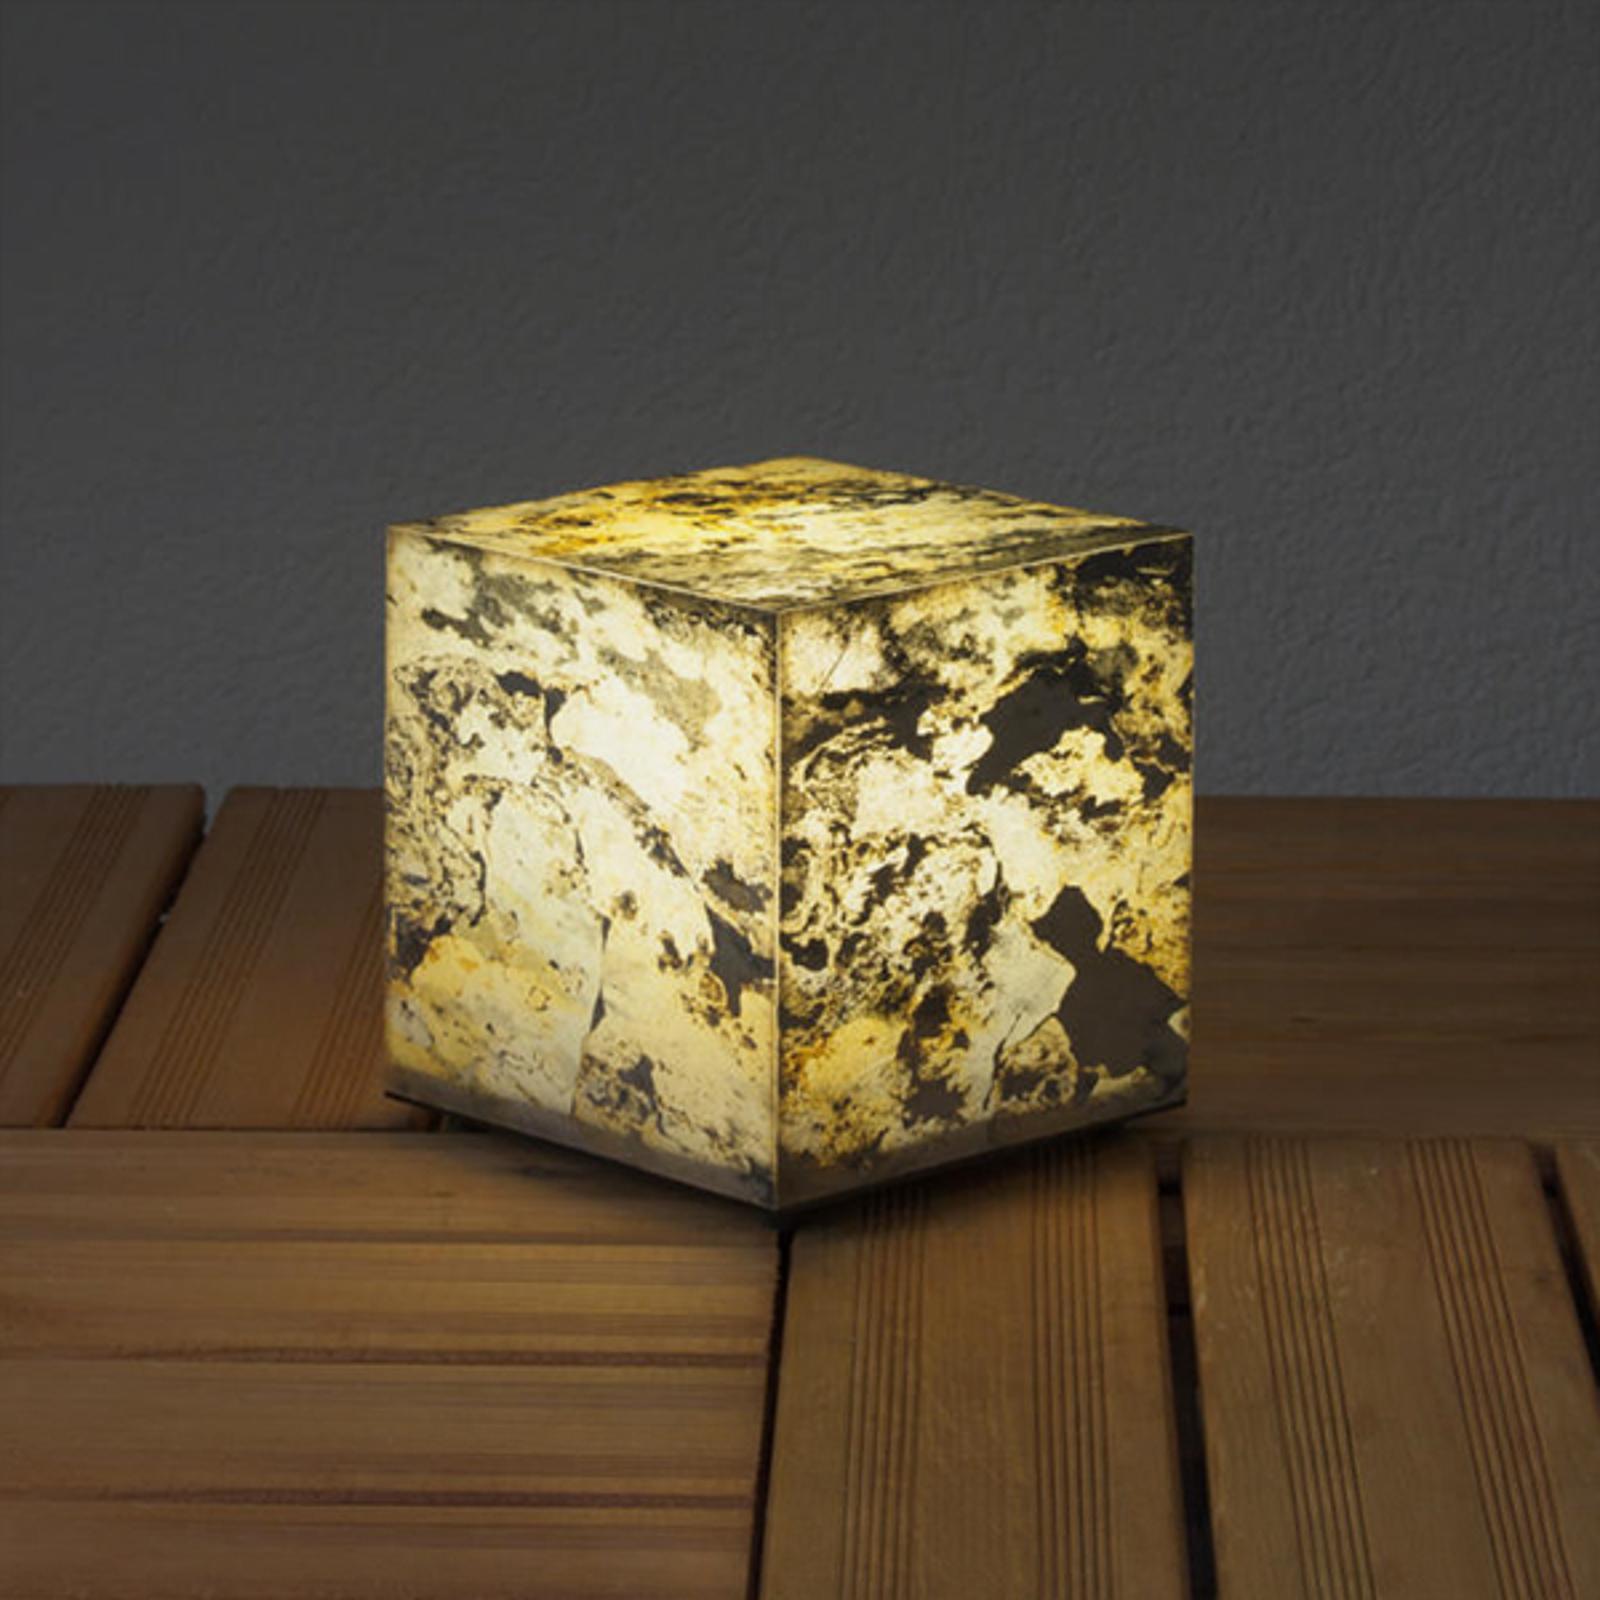 Dekorativ kubelampe i naturskifer, 19 cm